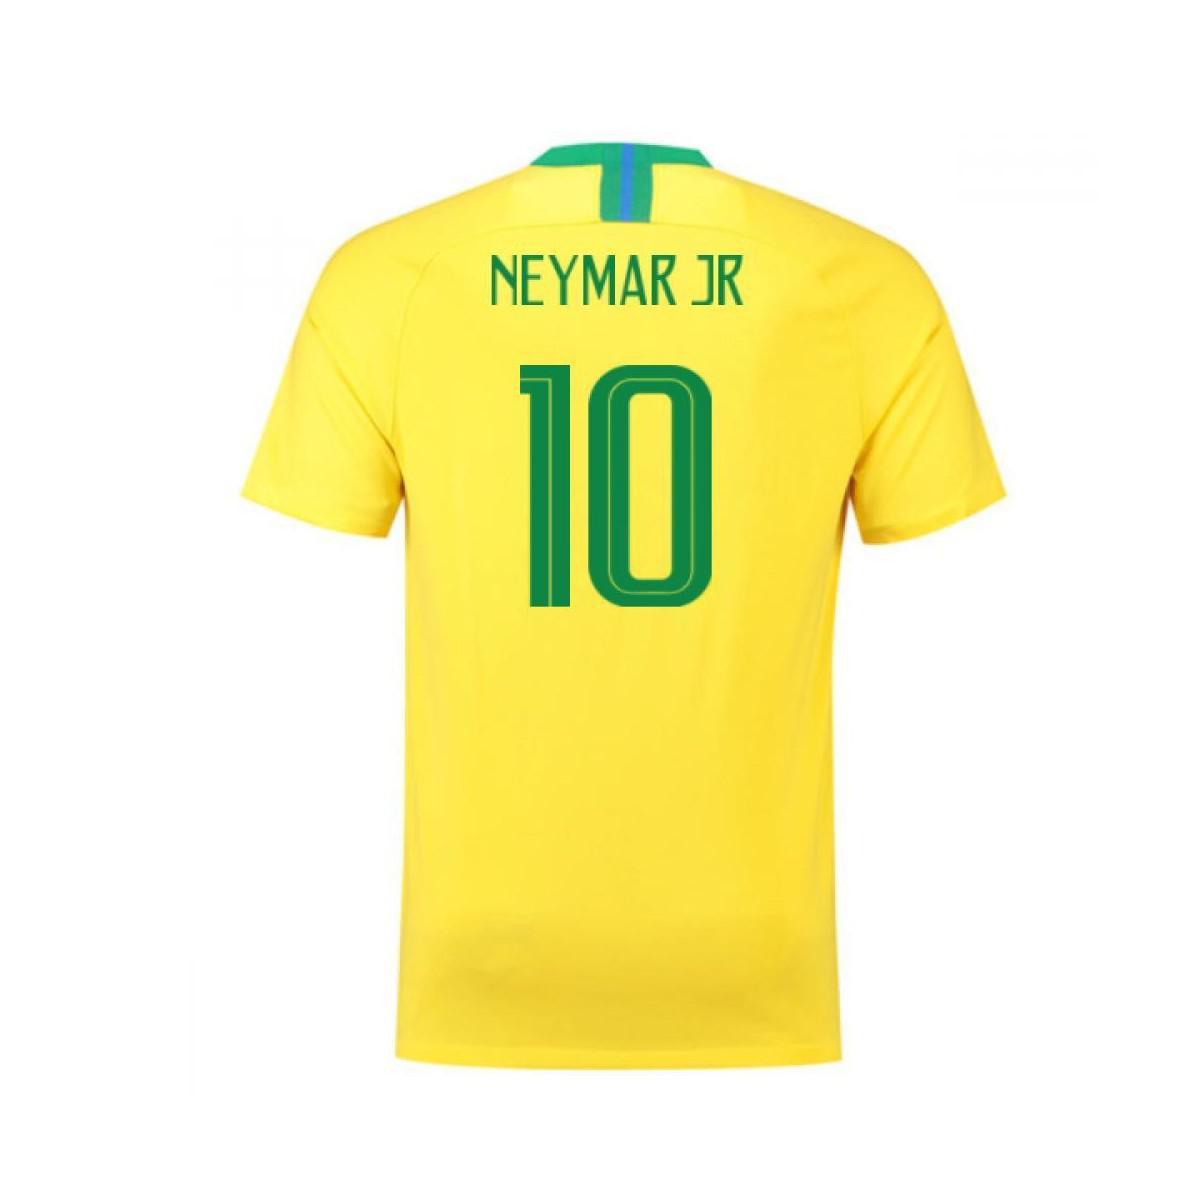 83f7c9d75 Brazil National Team Nike 2018 Home Replica Stadium Custom Jersey – Gold.  Gallery